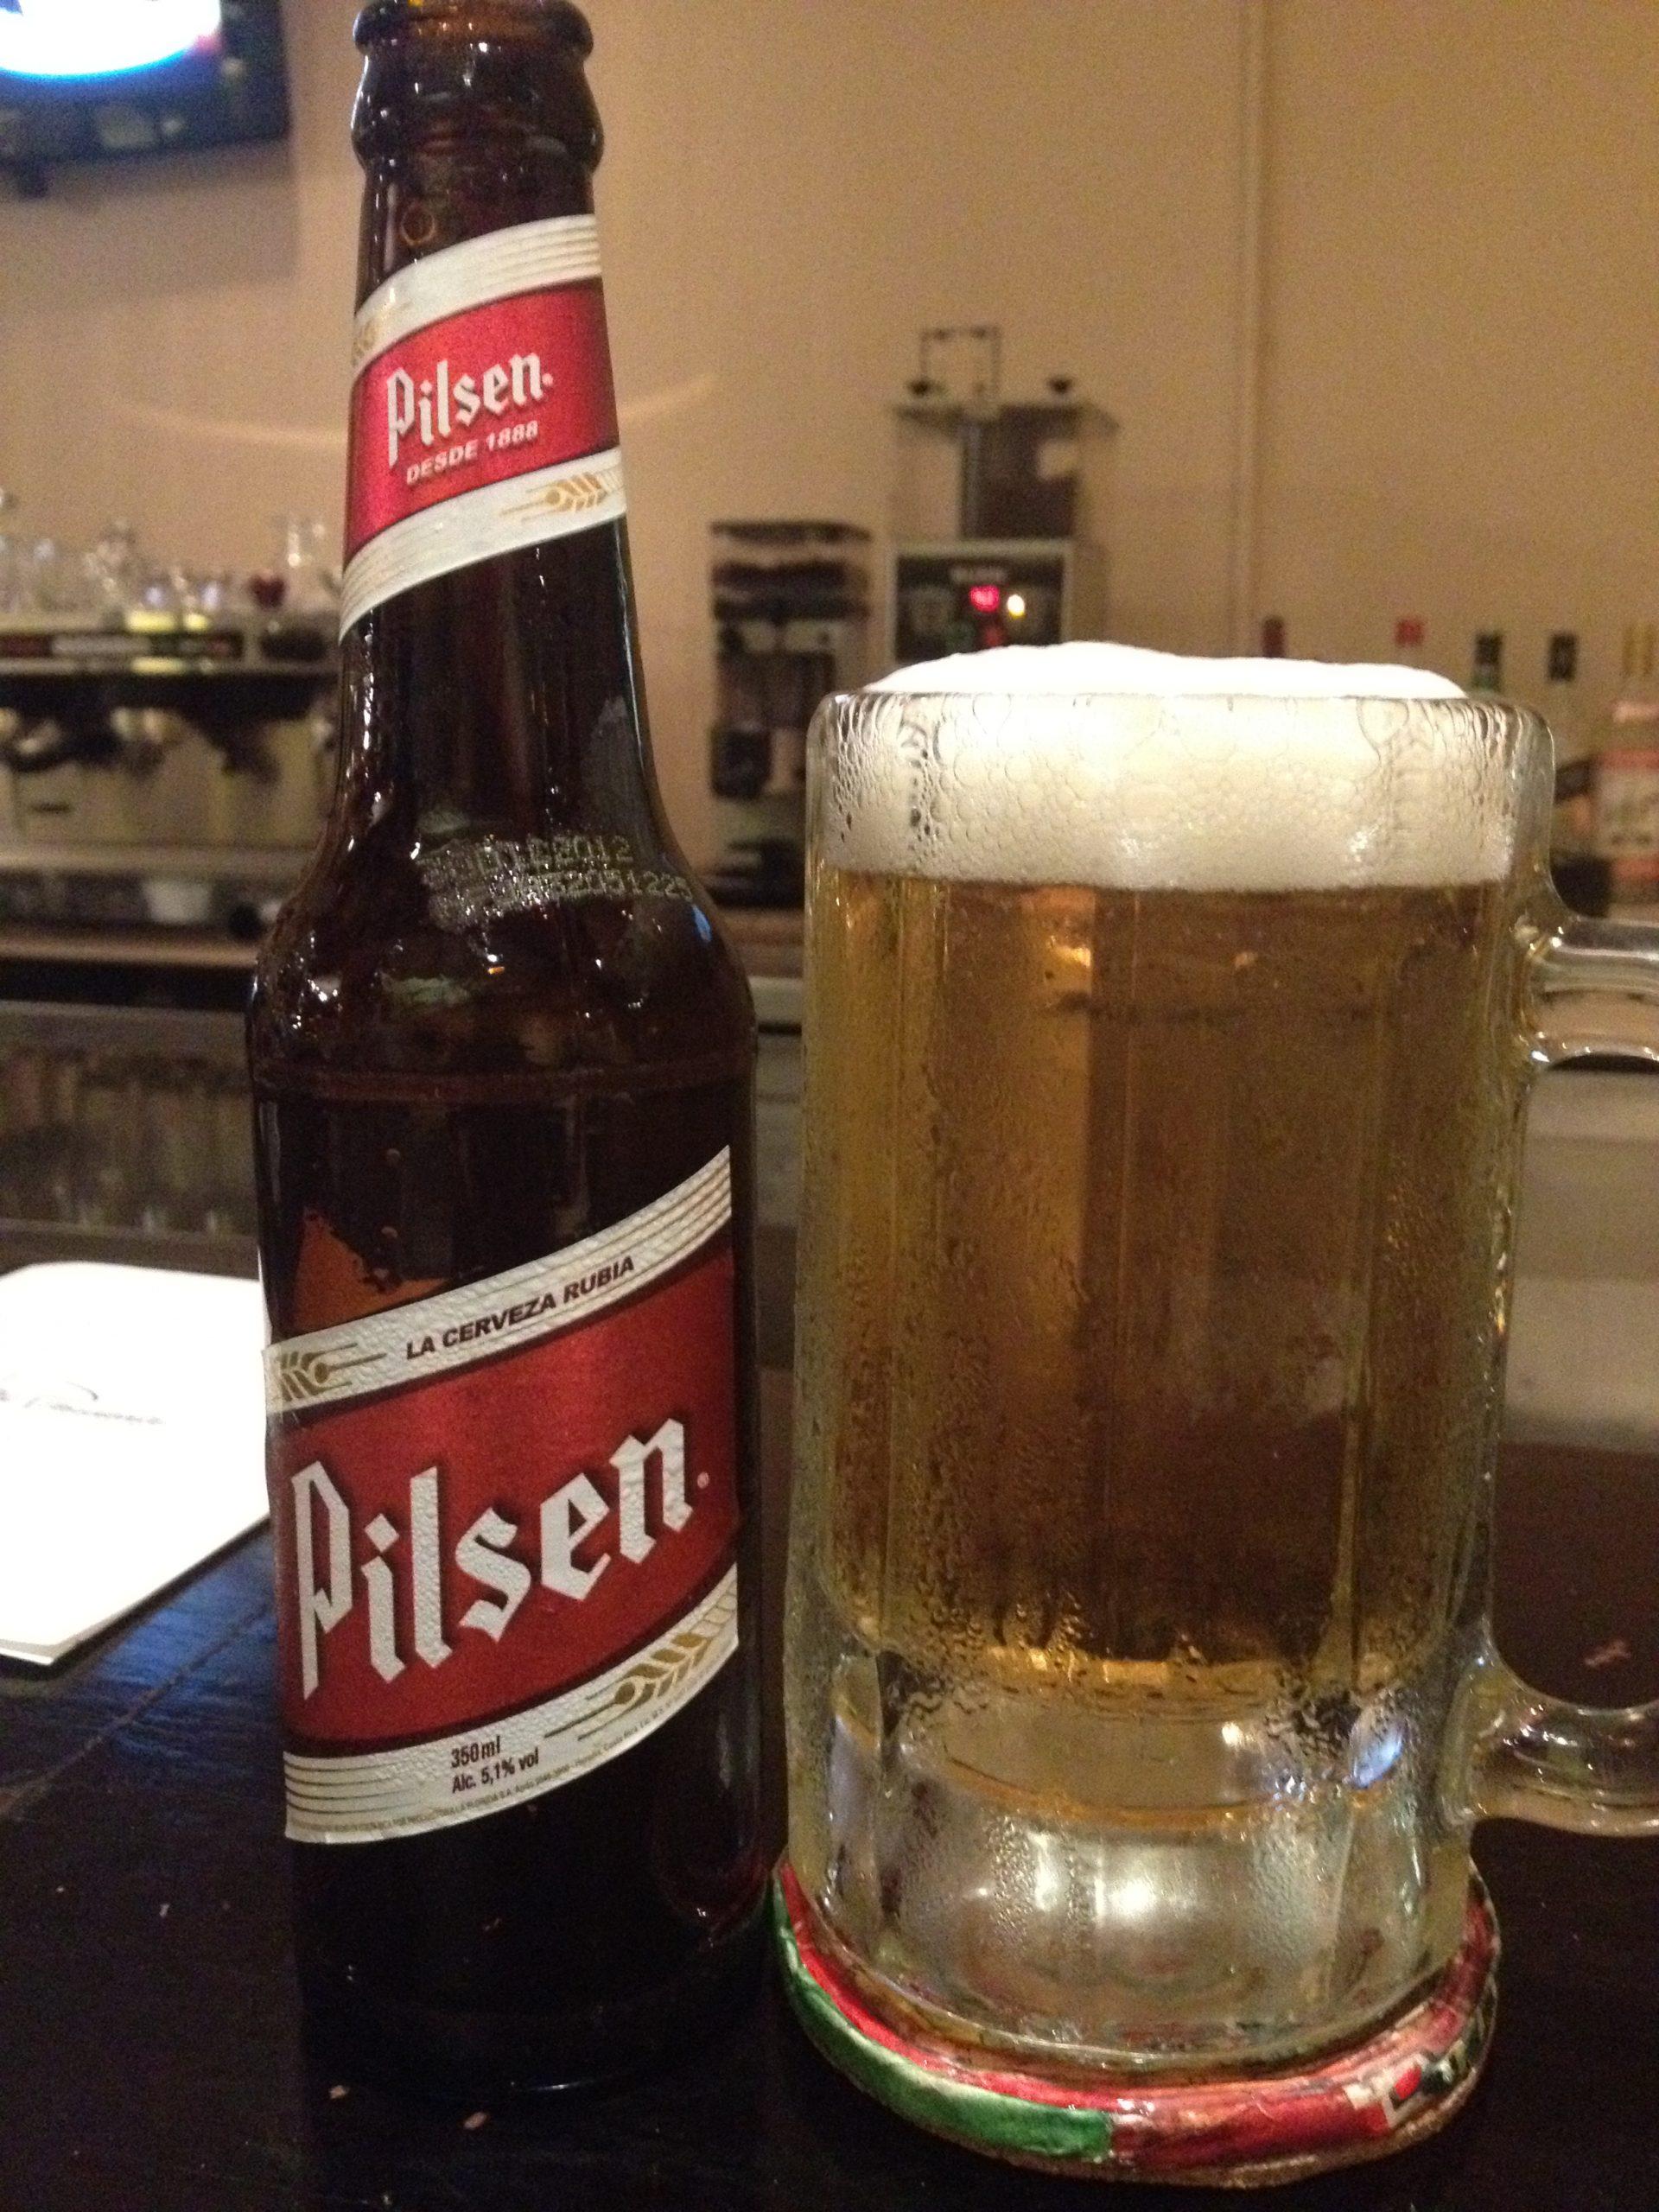 Costa Rican drinks, drinks in Costa Rica, Costa Rican Beverages, beers in Costa Rica, Pilsen Beer in Costa Rica